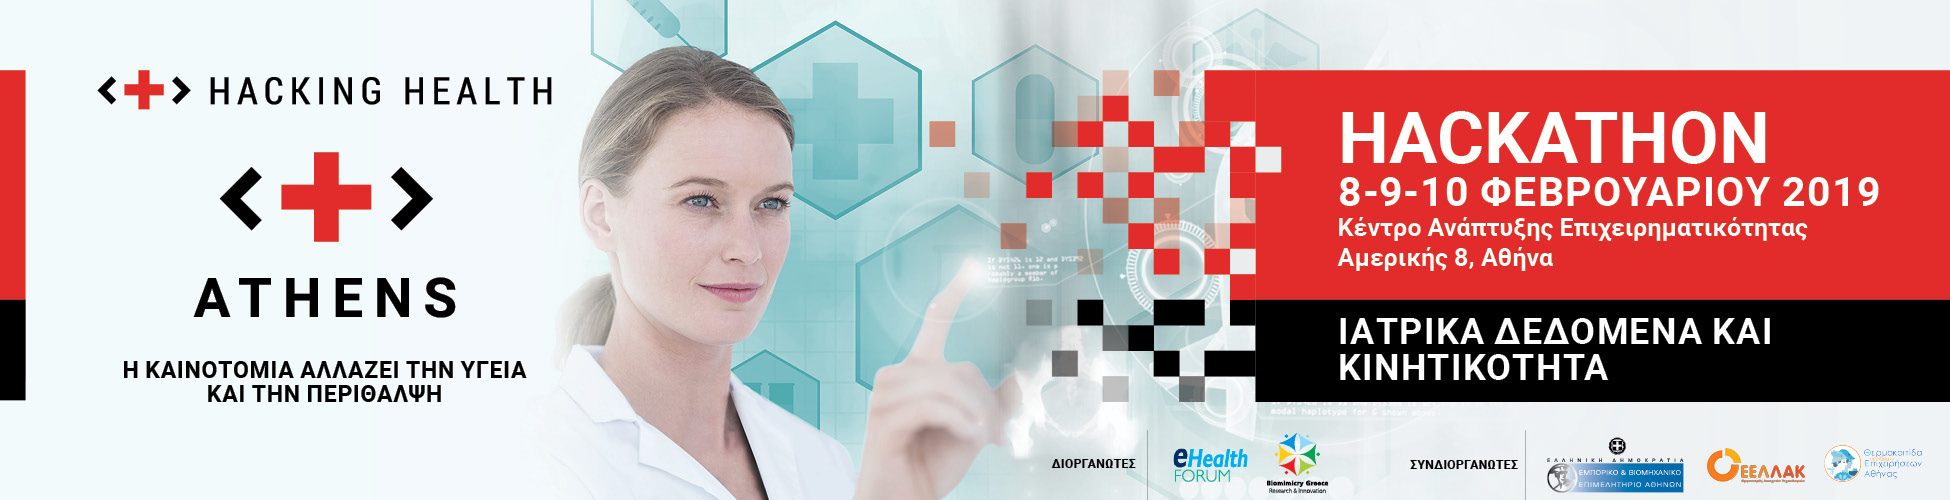 Hacking Health Athens